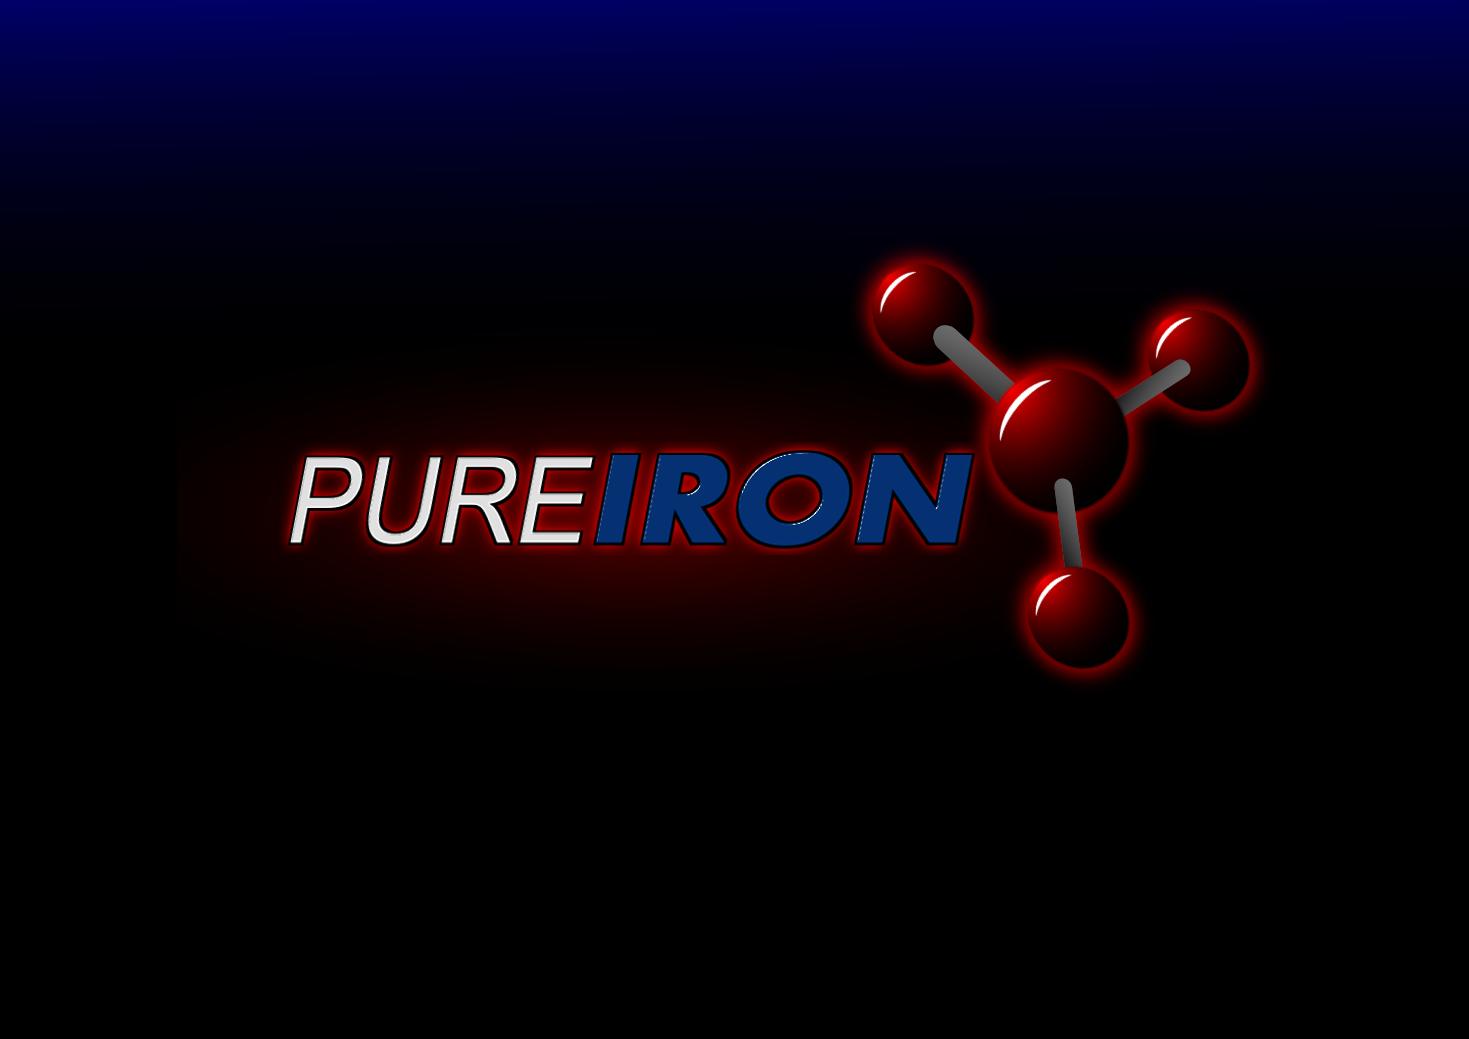 Logo Design by whoosef - Entry No. 160 in the Logo Design Contest Fun Logo Design for Pure Iron.